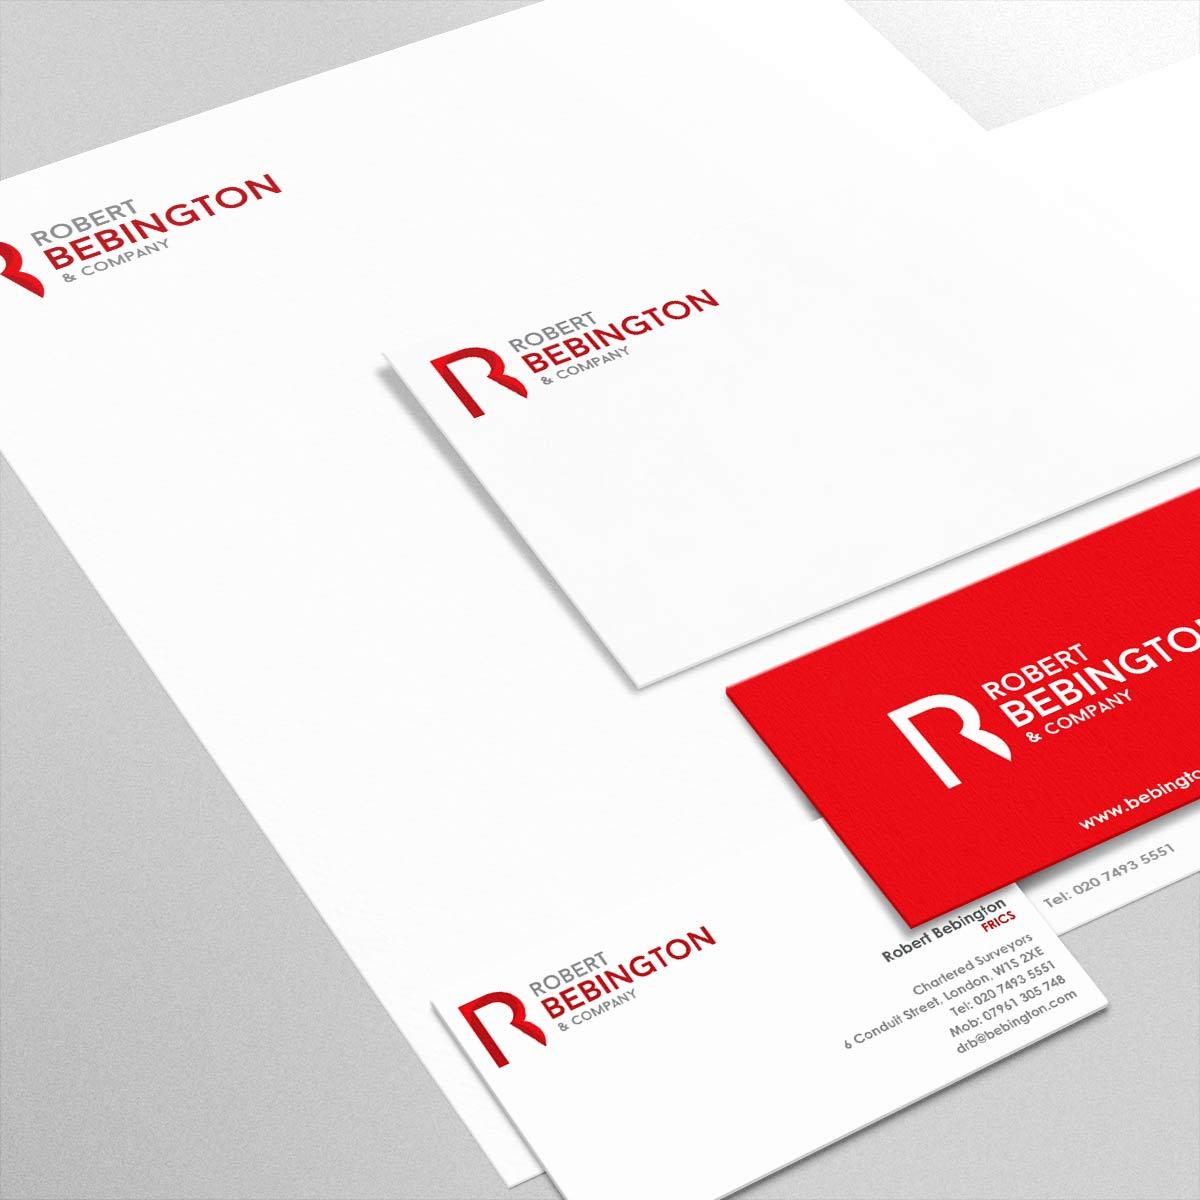 Bebington stationary design